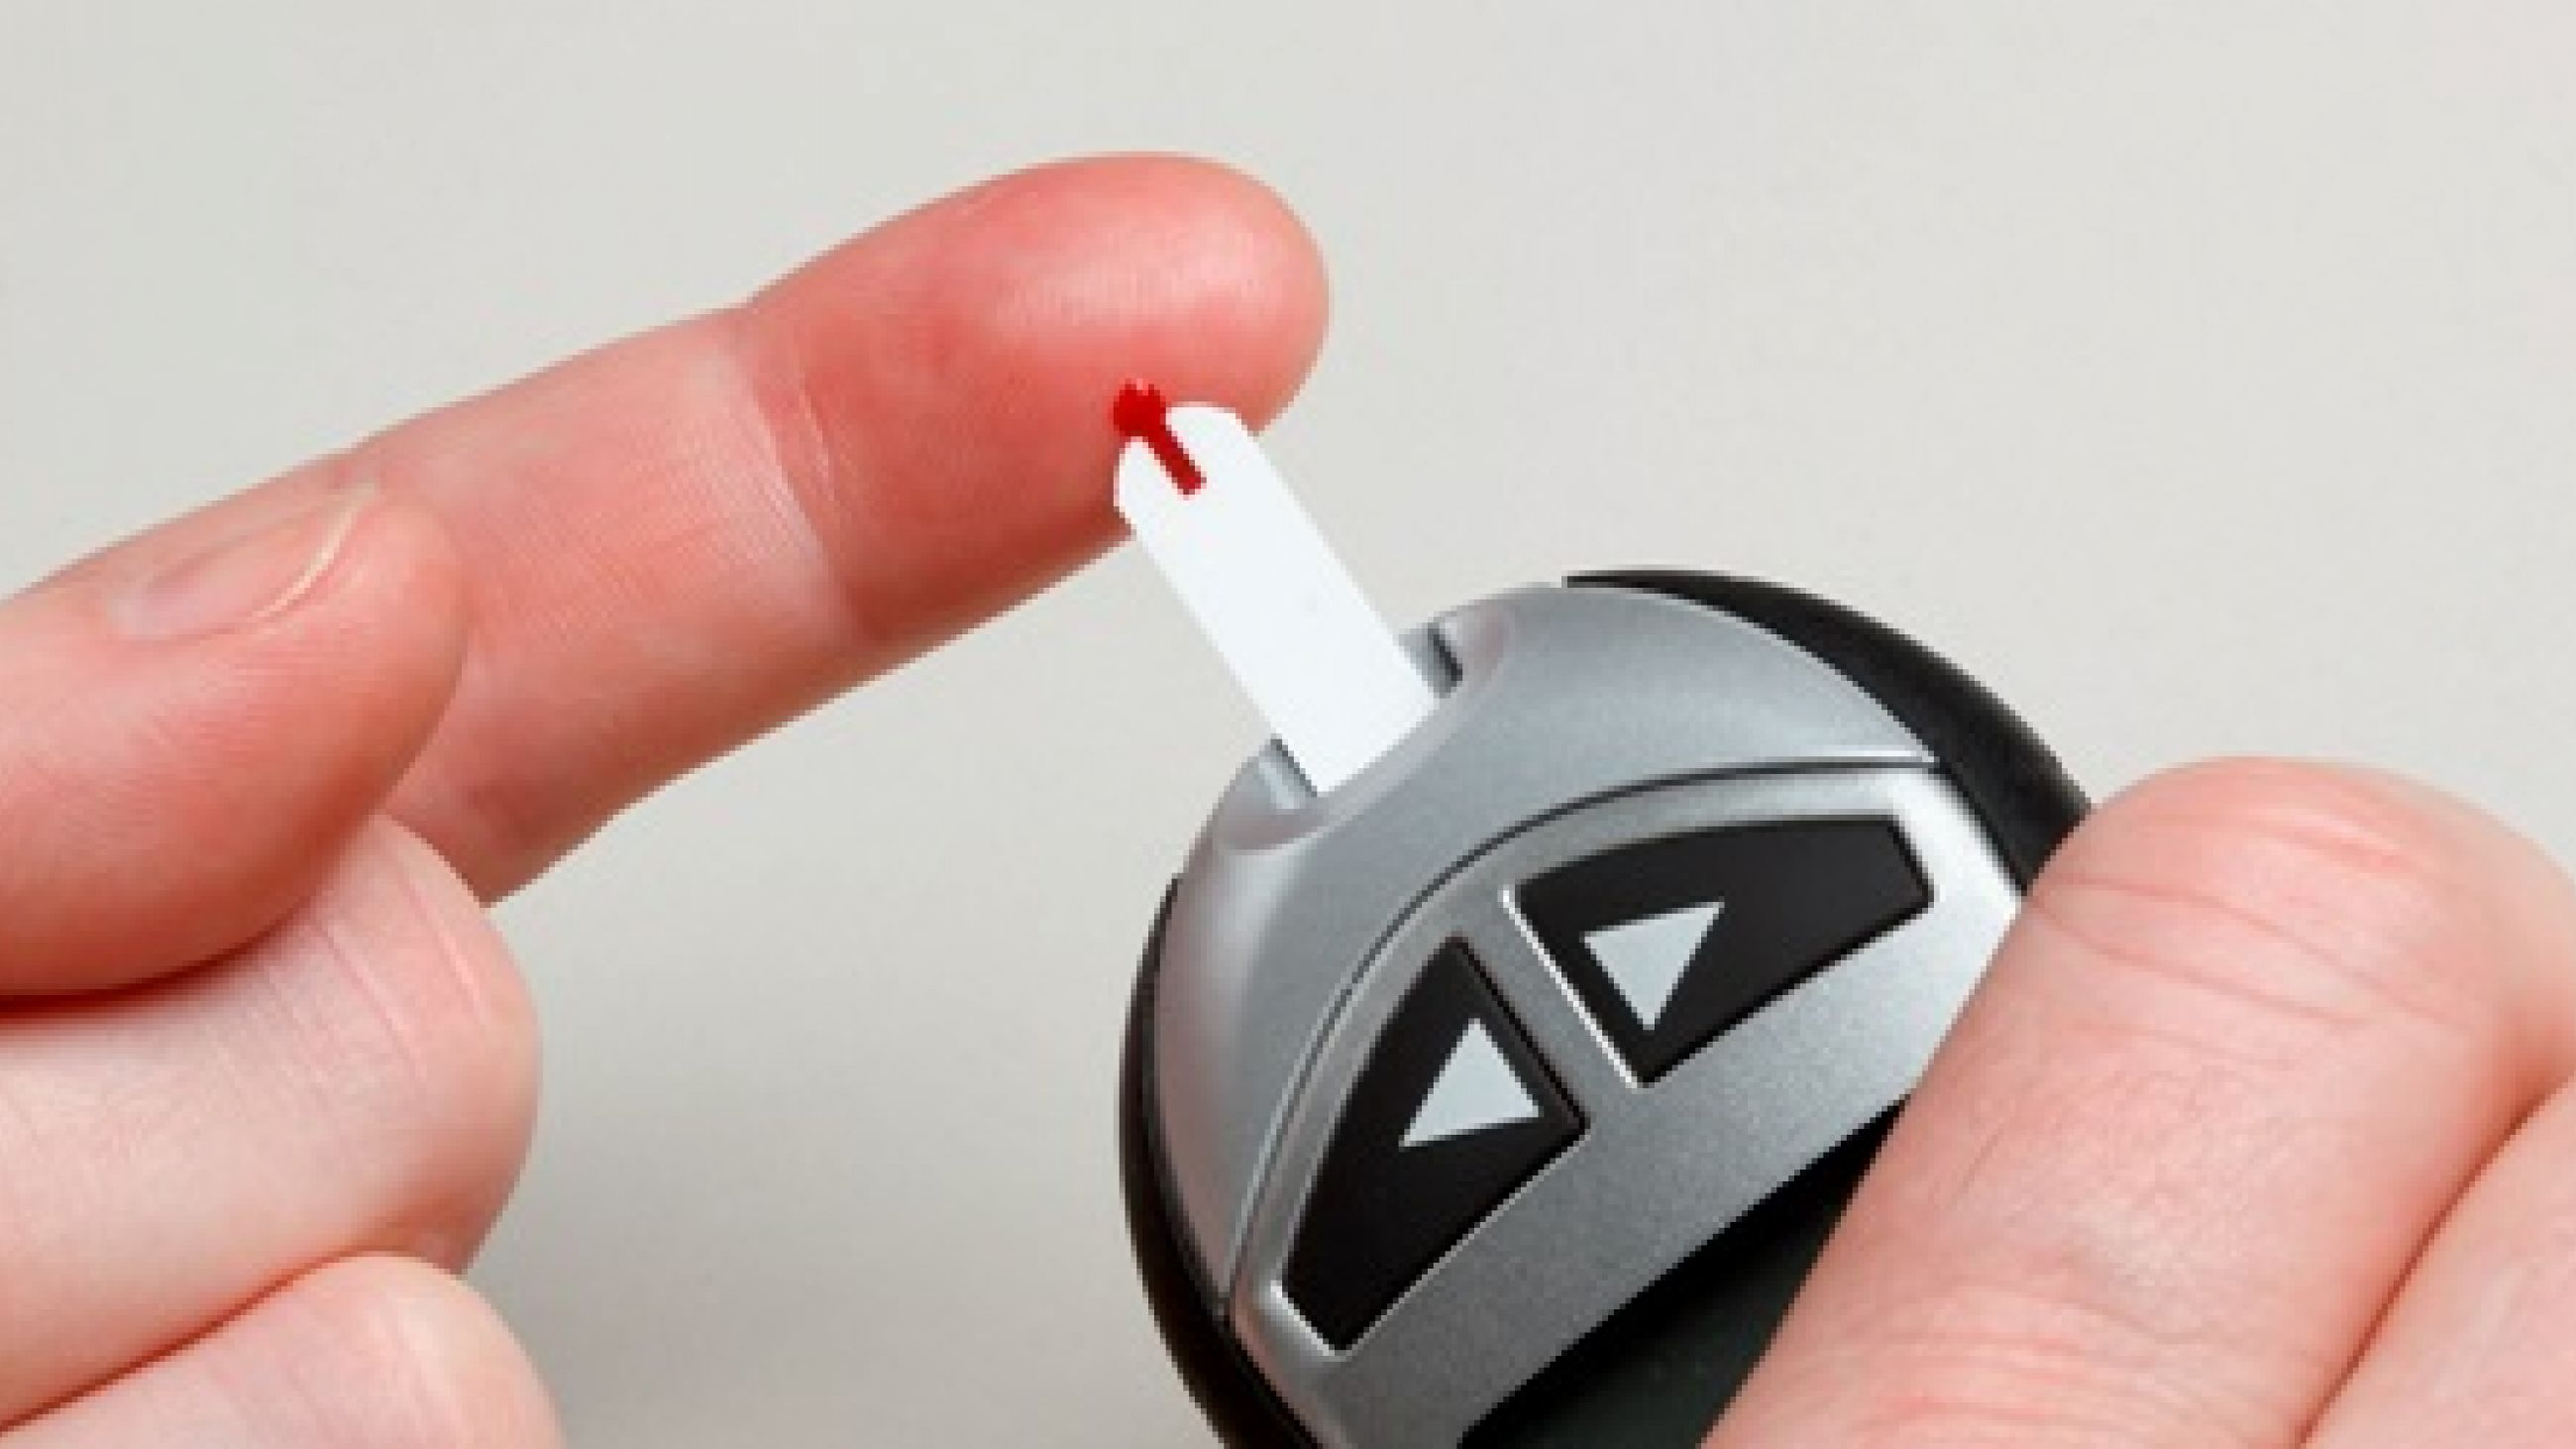 IVD test strips